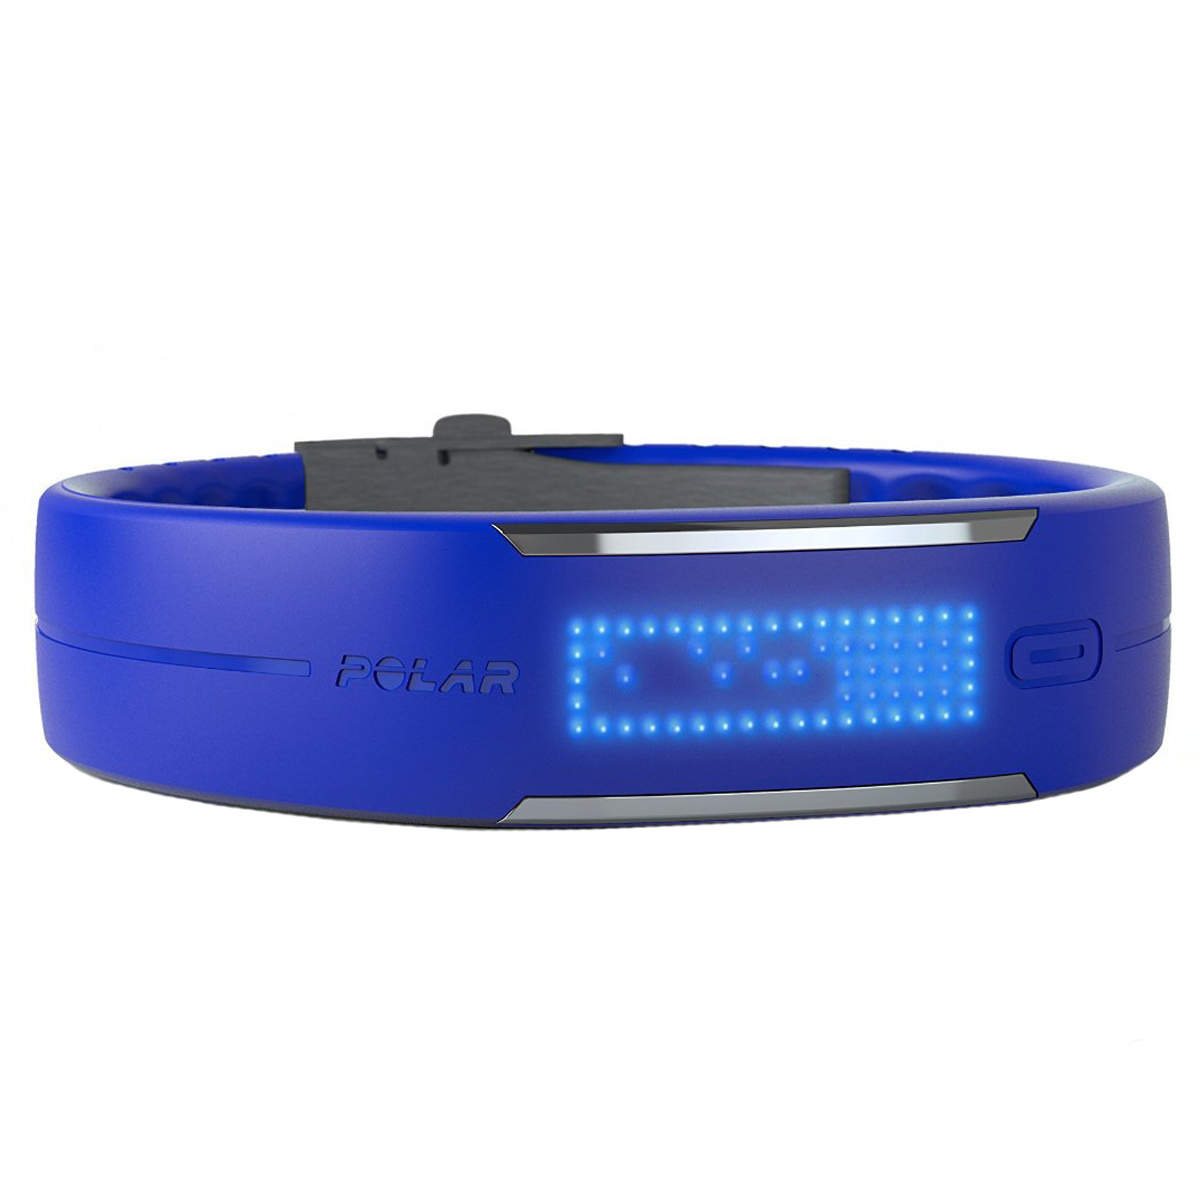 Polar Loop 24-Hour Activity Tracker Smart Wristband